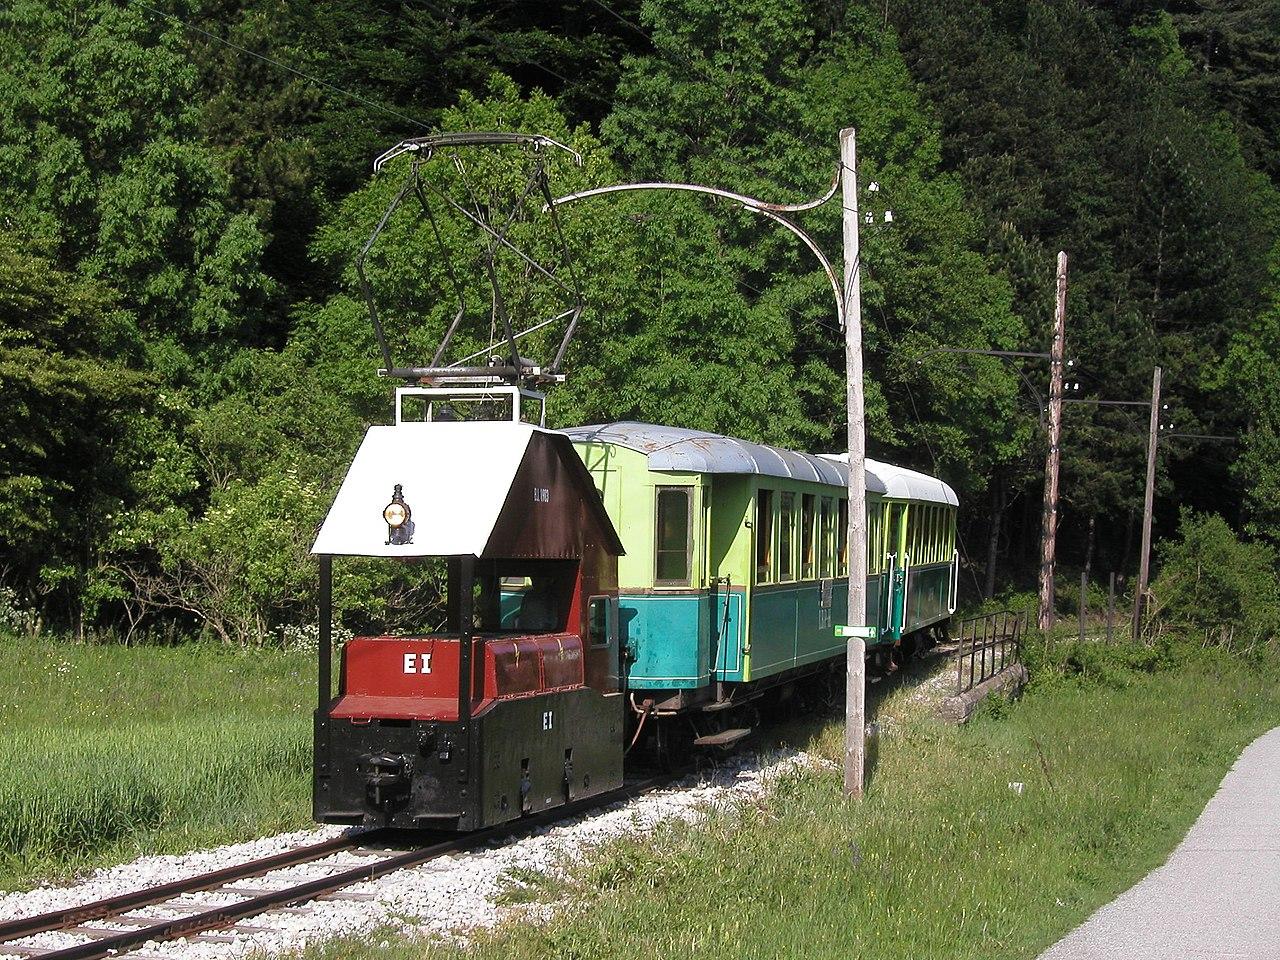 locomotora de tren local